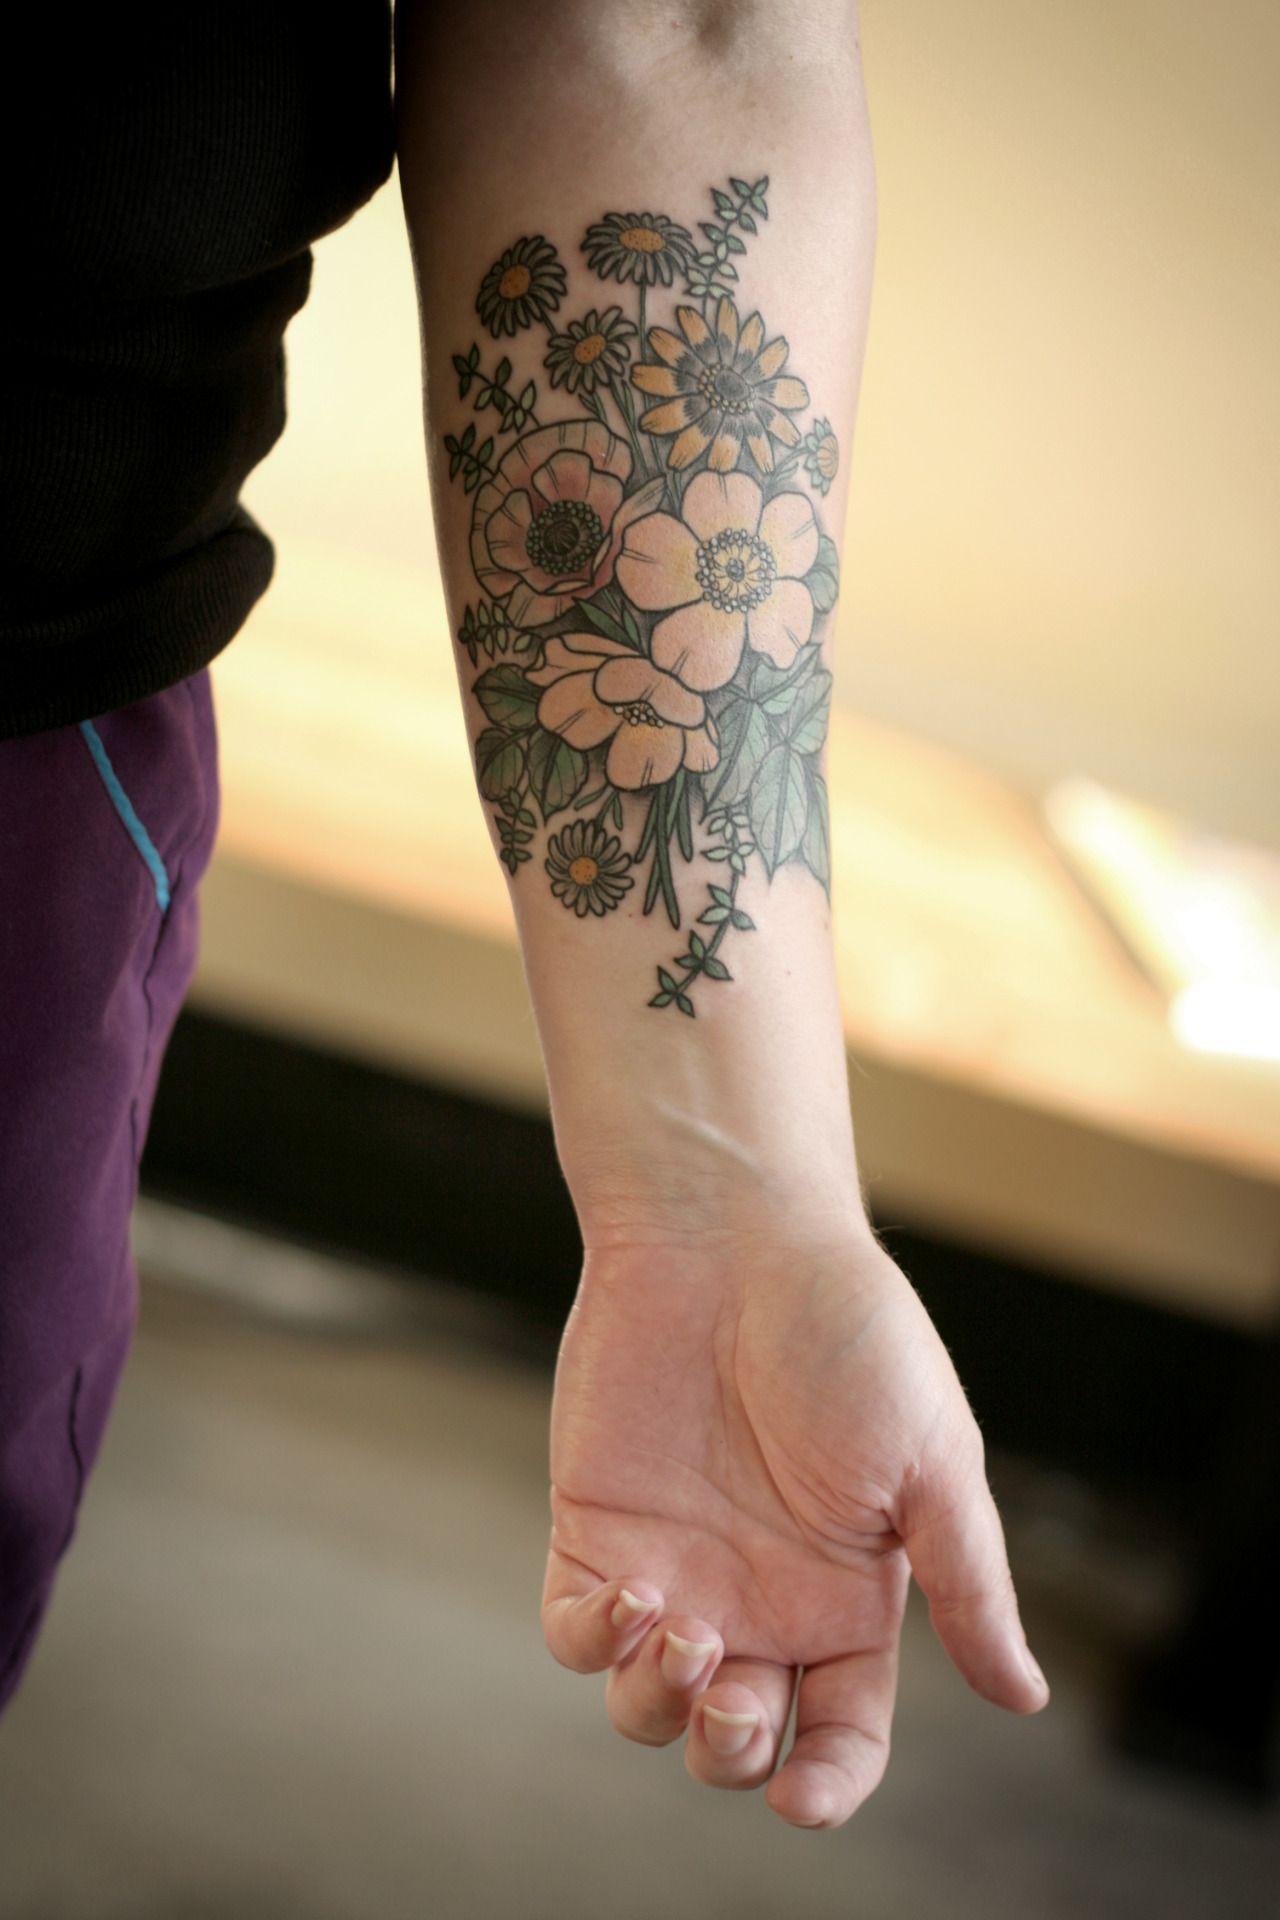 Pretty Daisy Tattoo: Pretty Tattoo Girly Daisy Color Tattoo Bouquet Wild Rose